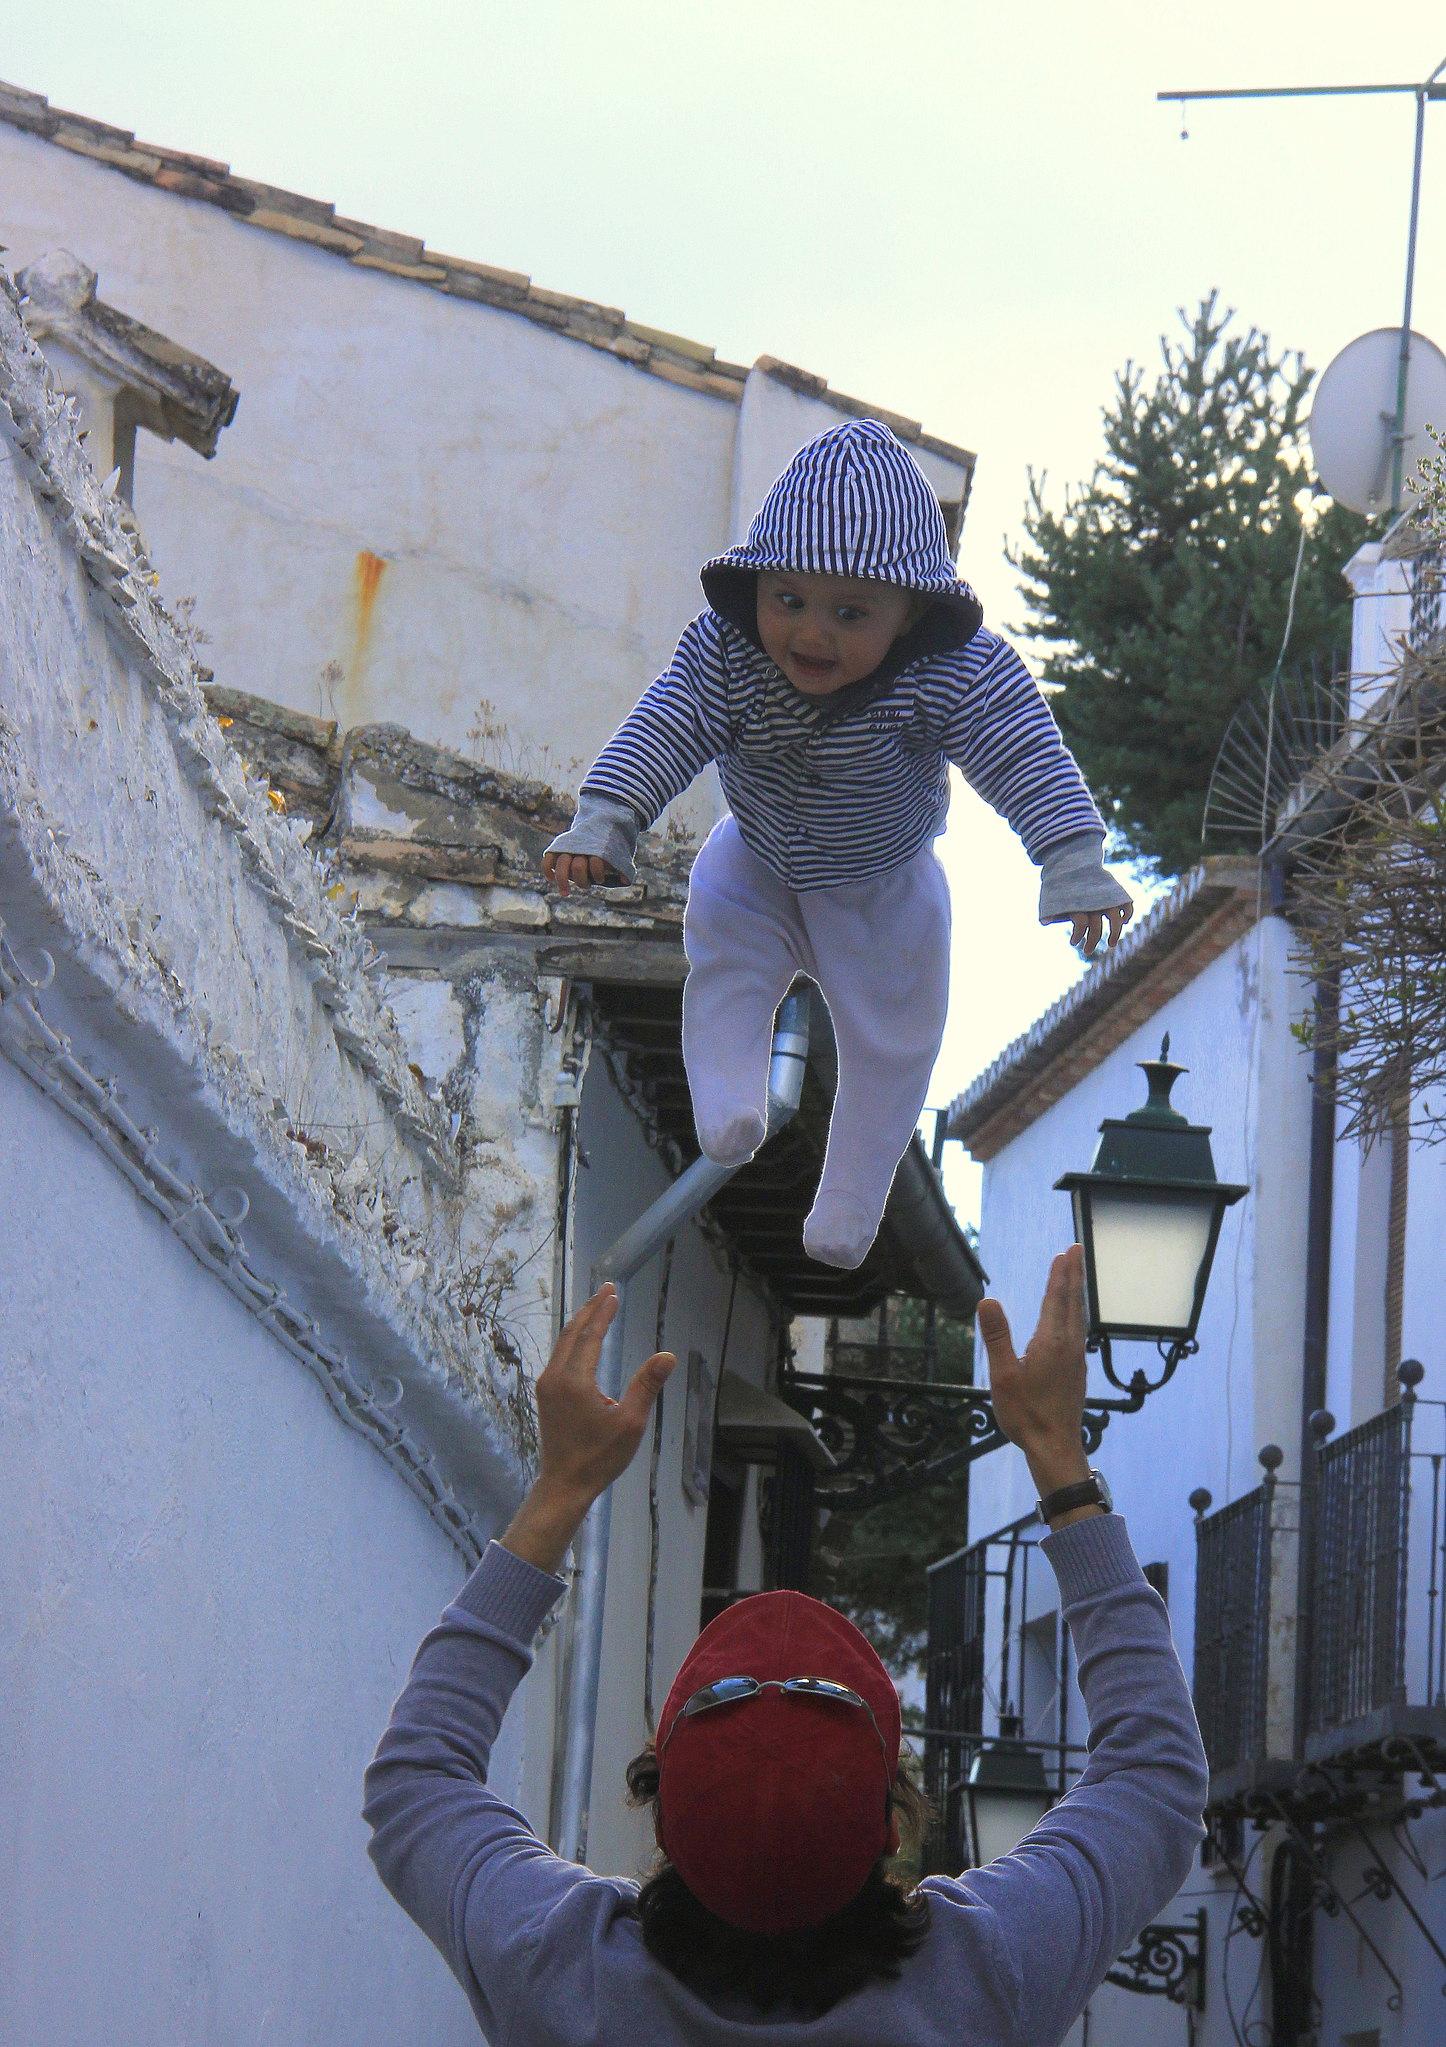 Tourists visit albaicin in Granada